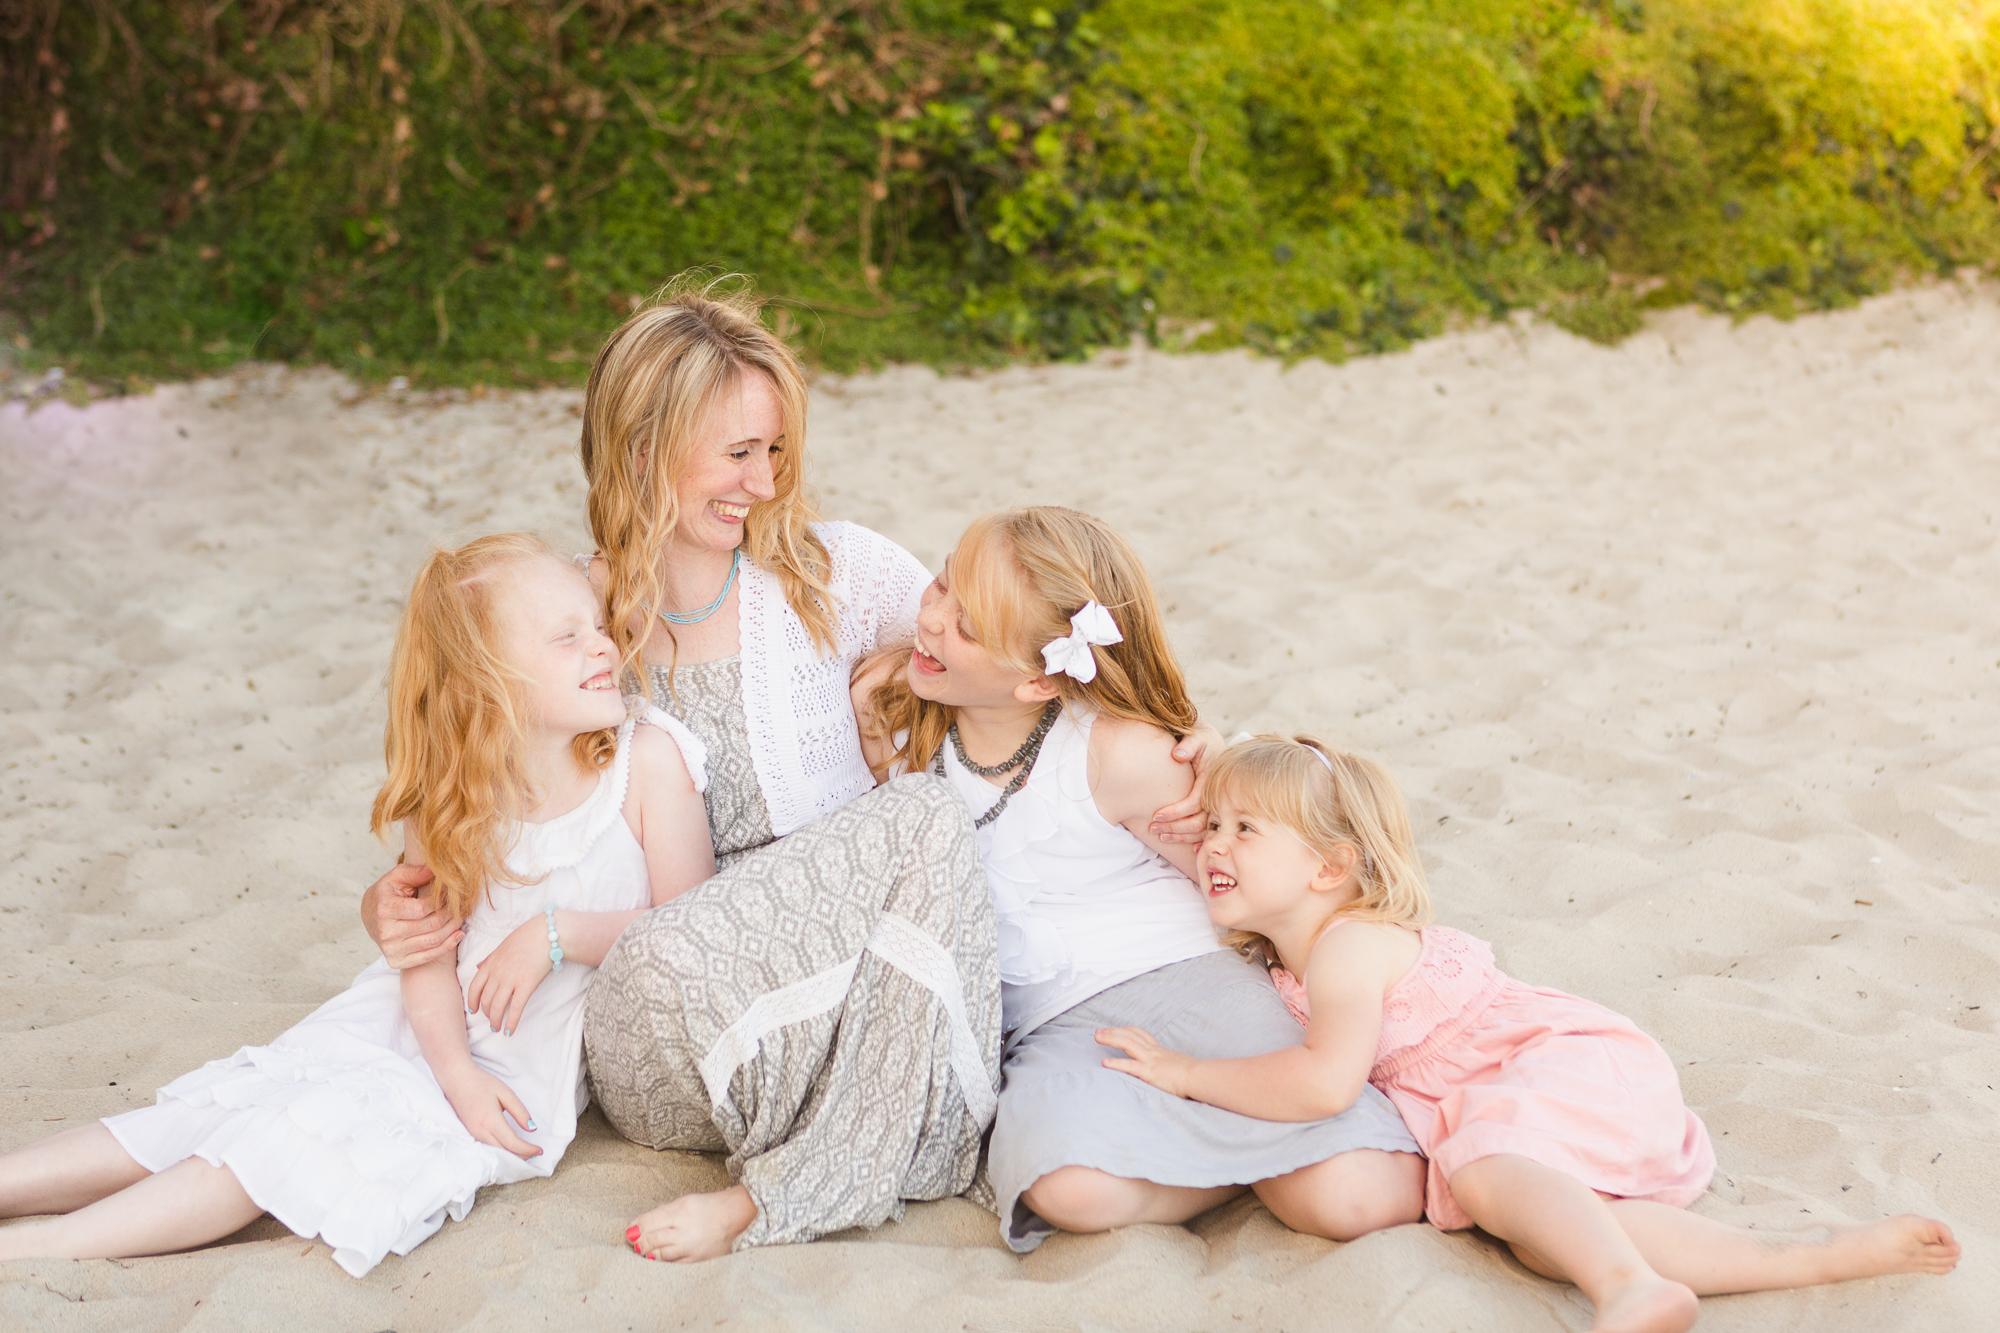 San-Diego-Photographer-Christine-Dammann-mother-daughter-pacific-beach-ws-1.jpg